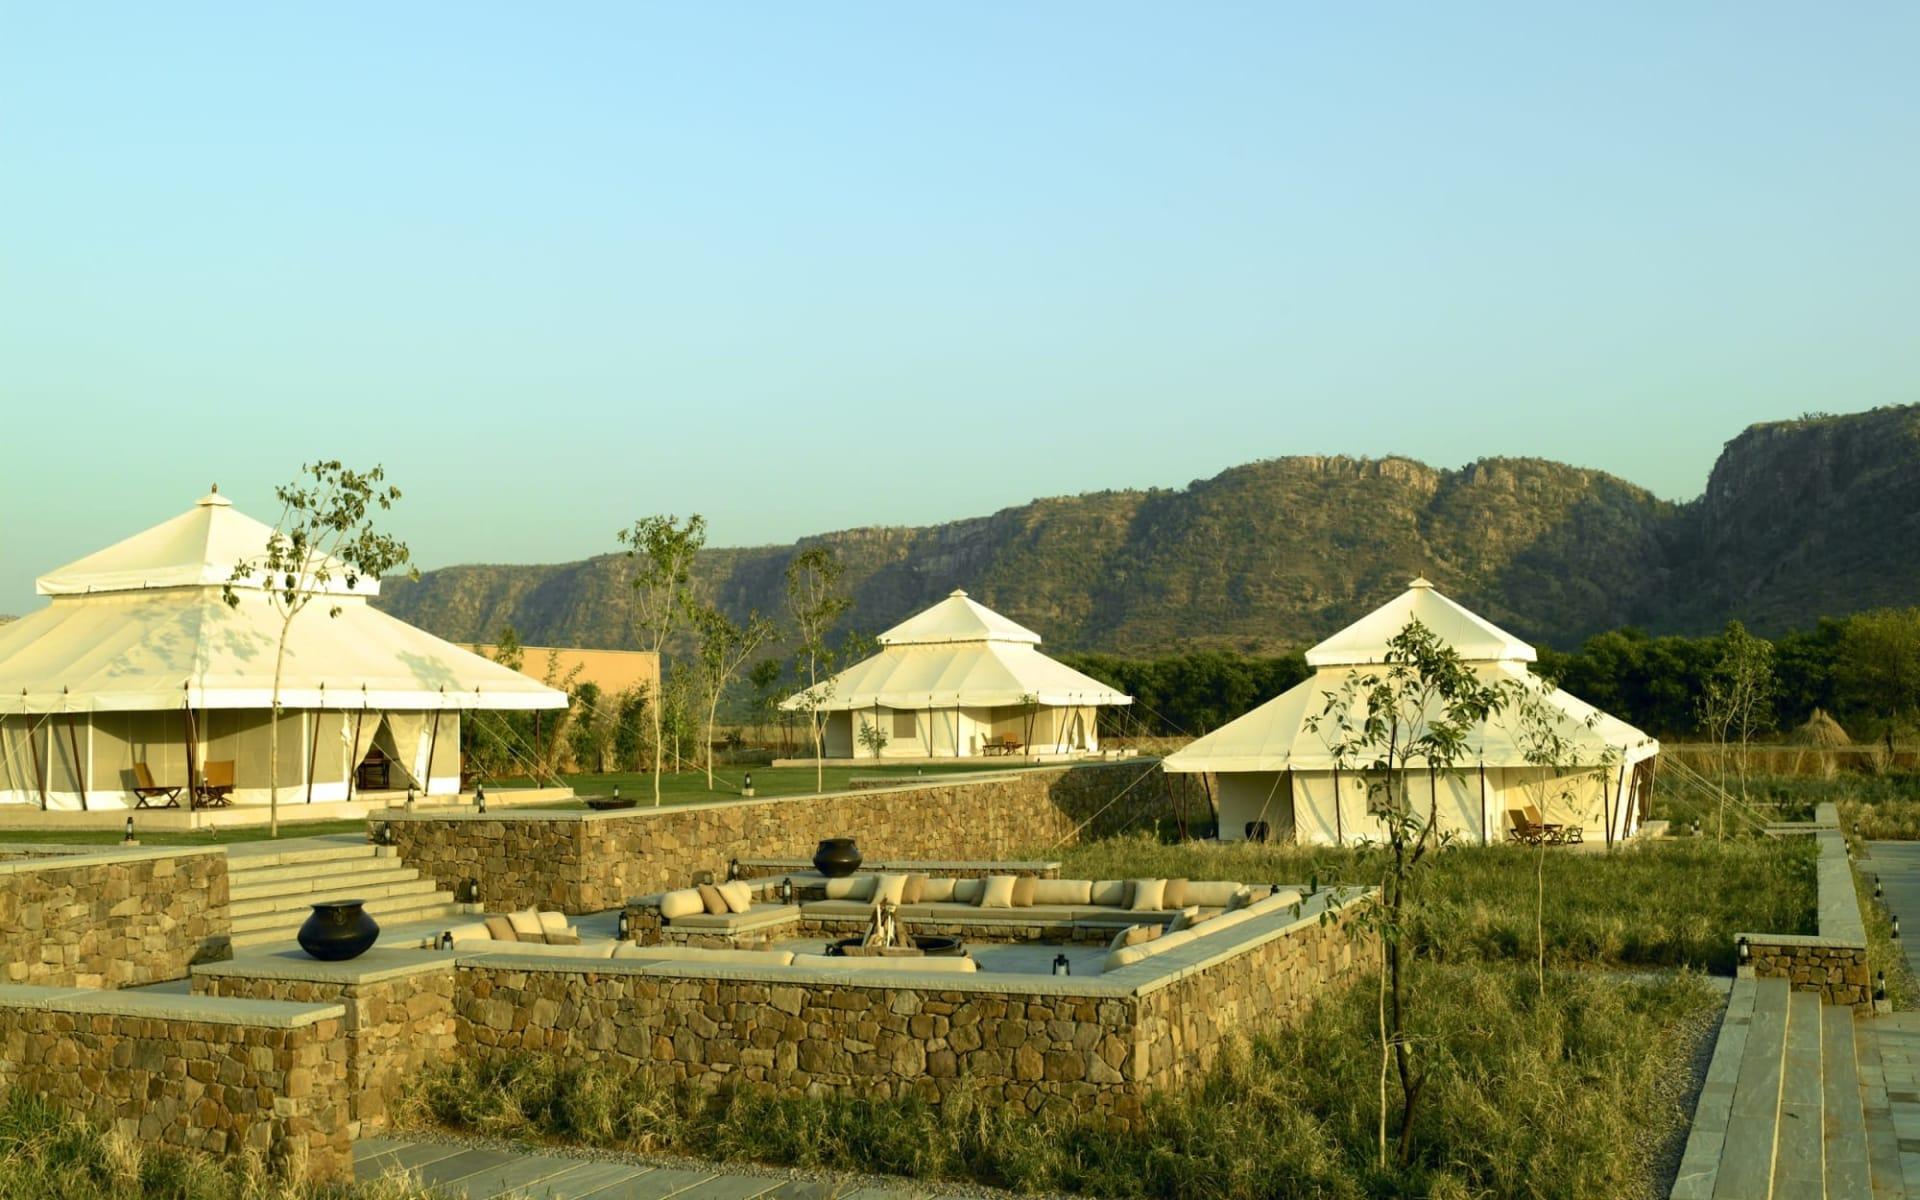 Aman-i-Khas in Ranthambore: tents and aravalli hills